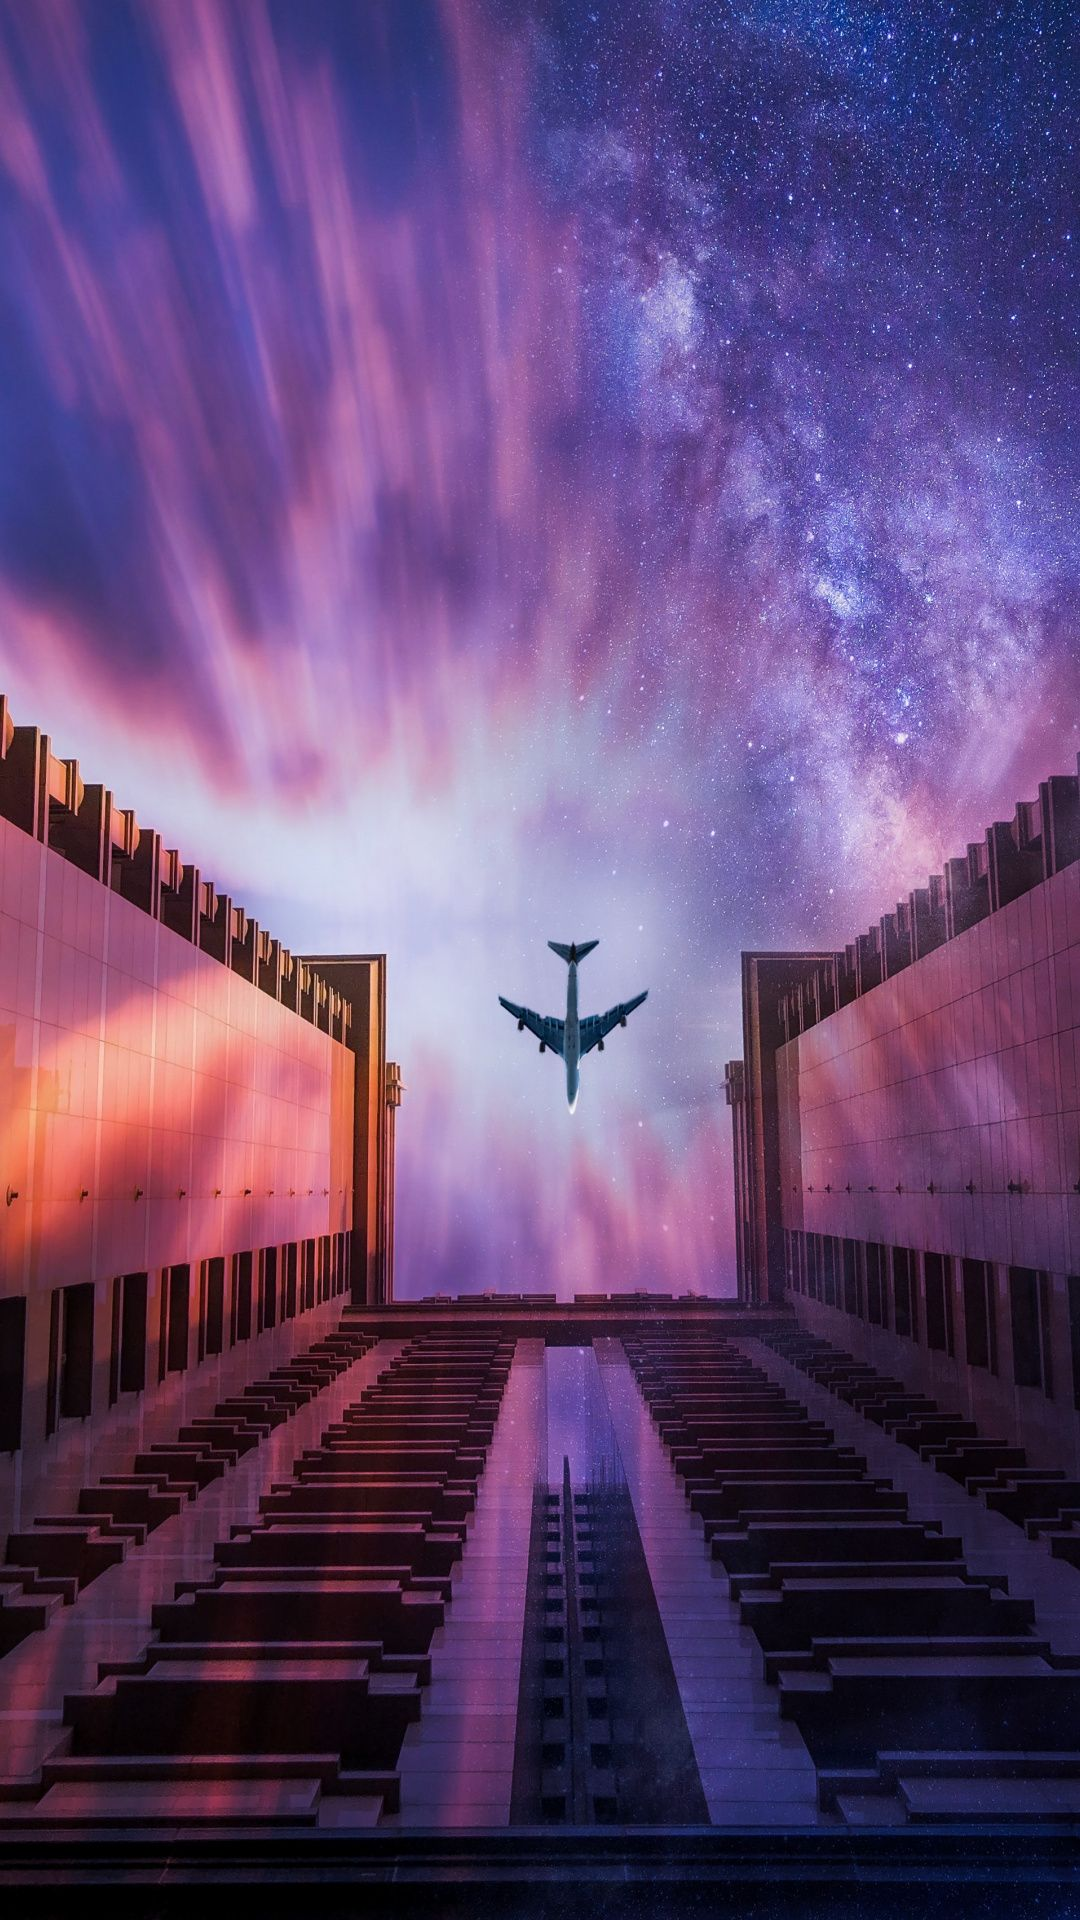 1080x1920 Airplane, sunset, sky, buildings wallpaper